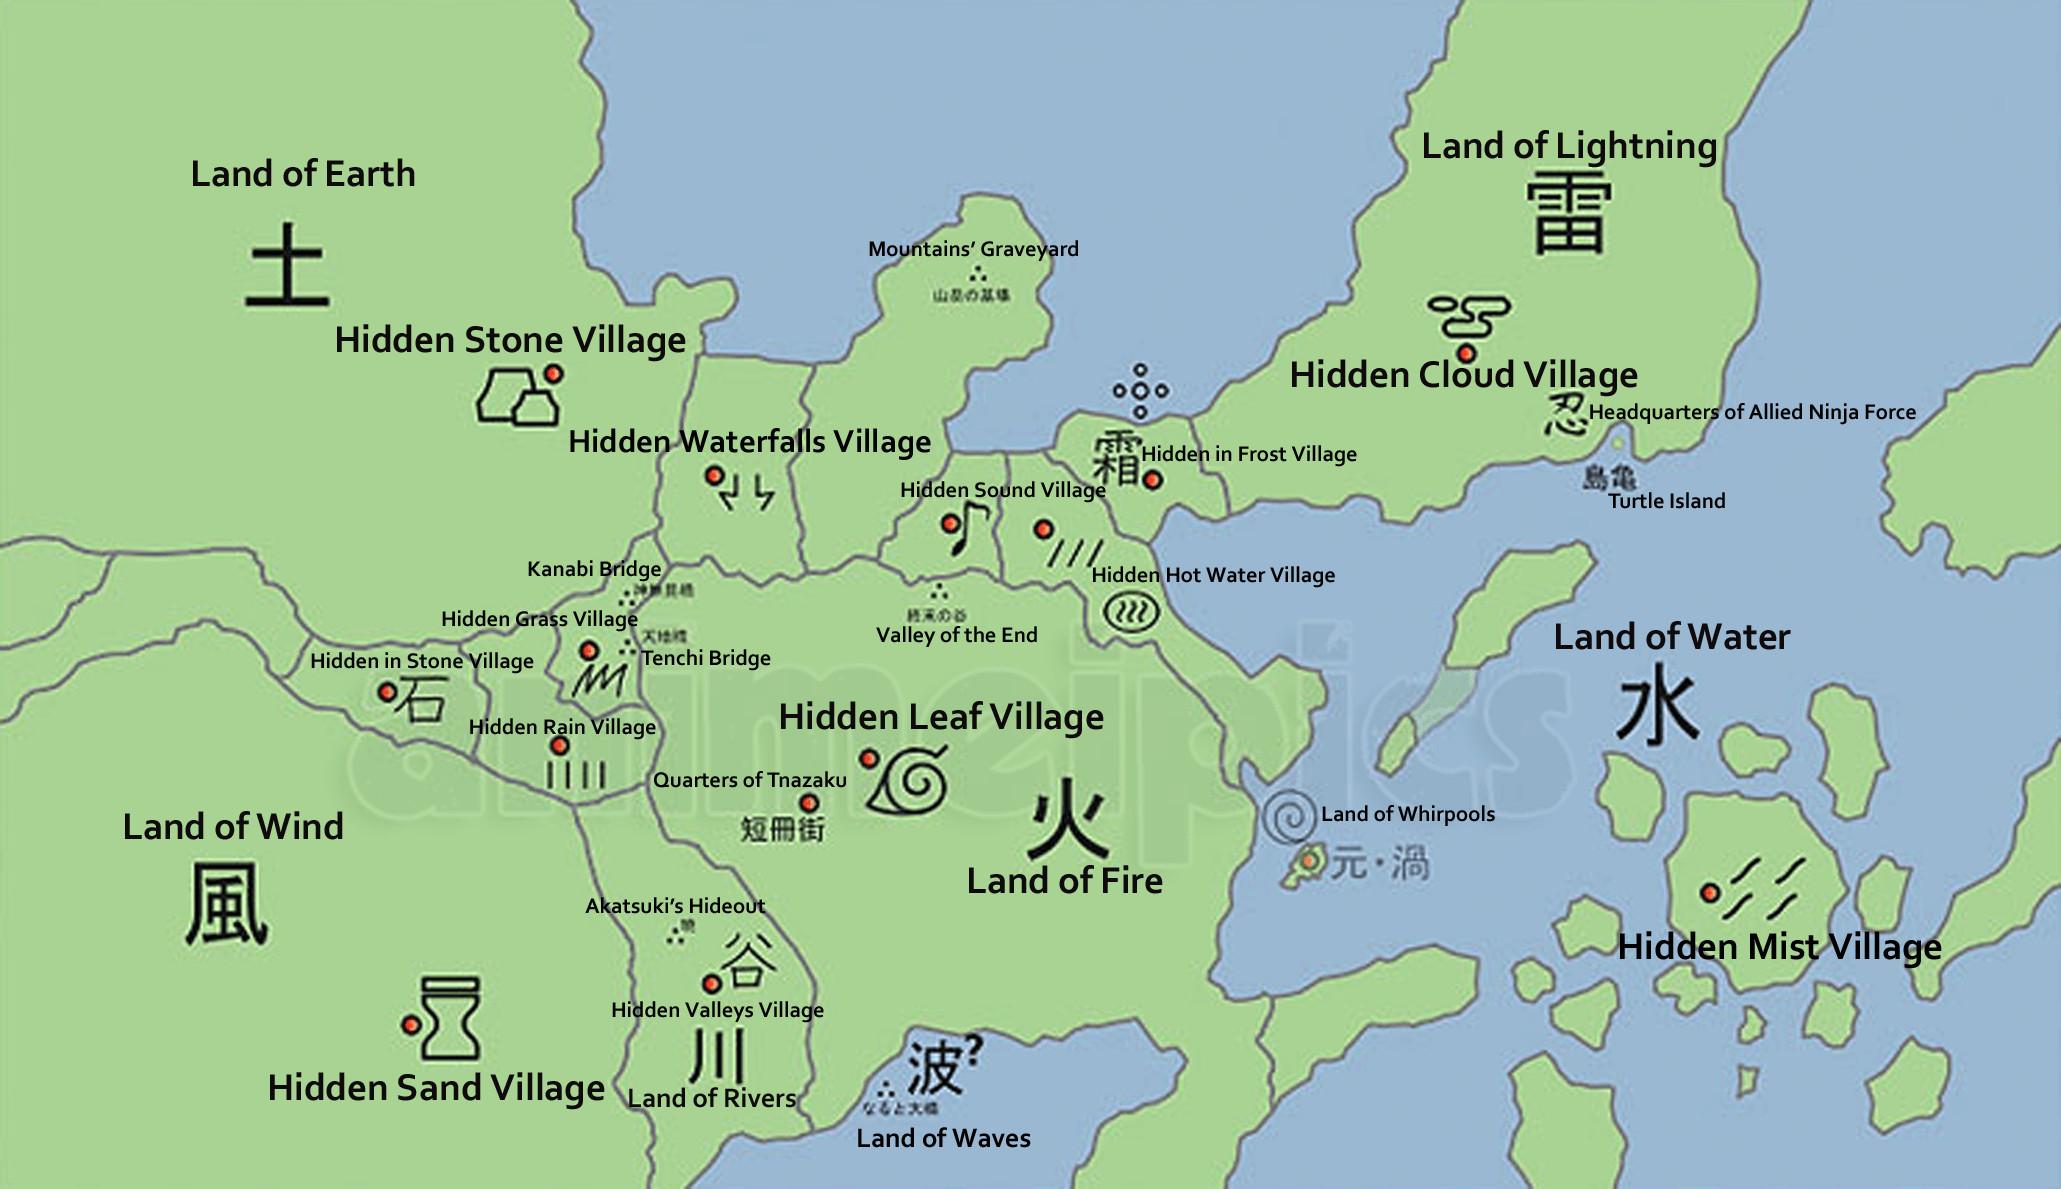 Naruto World Map Lands and Hidden Villages